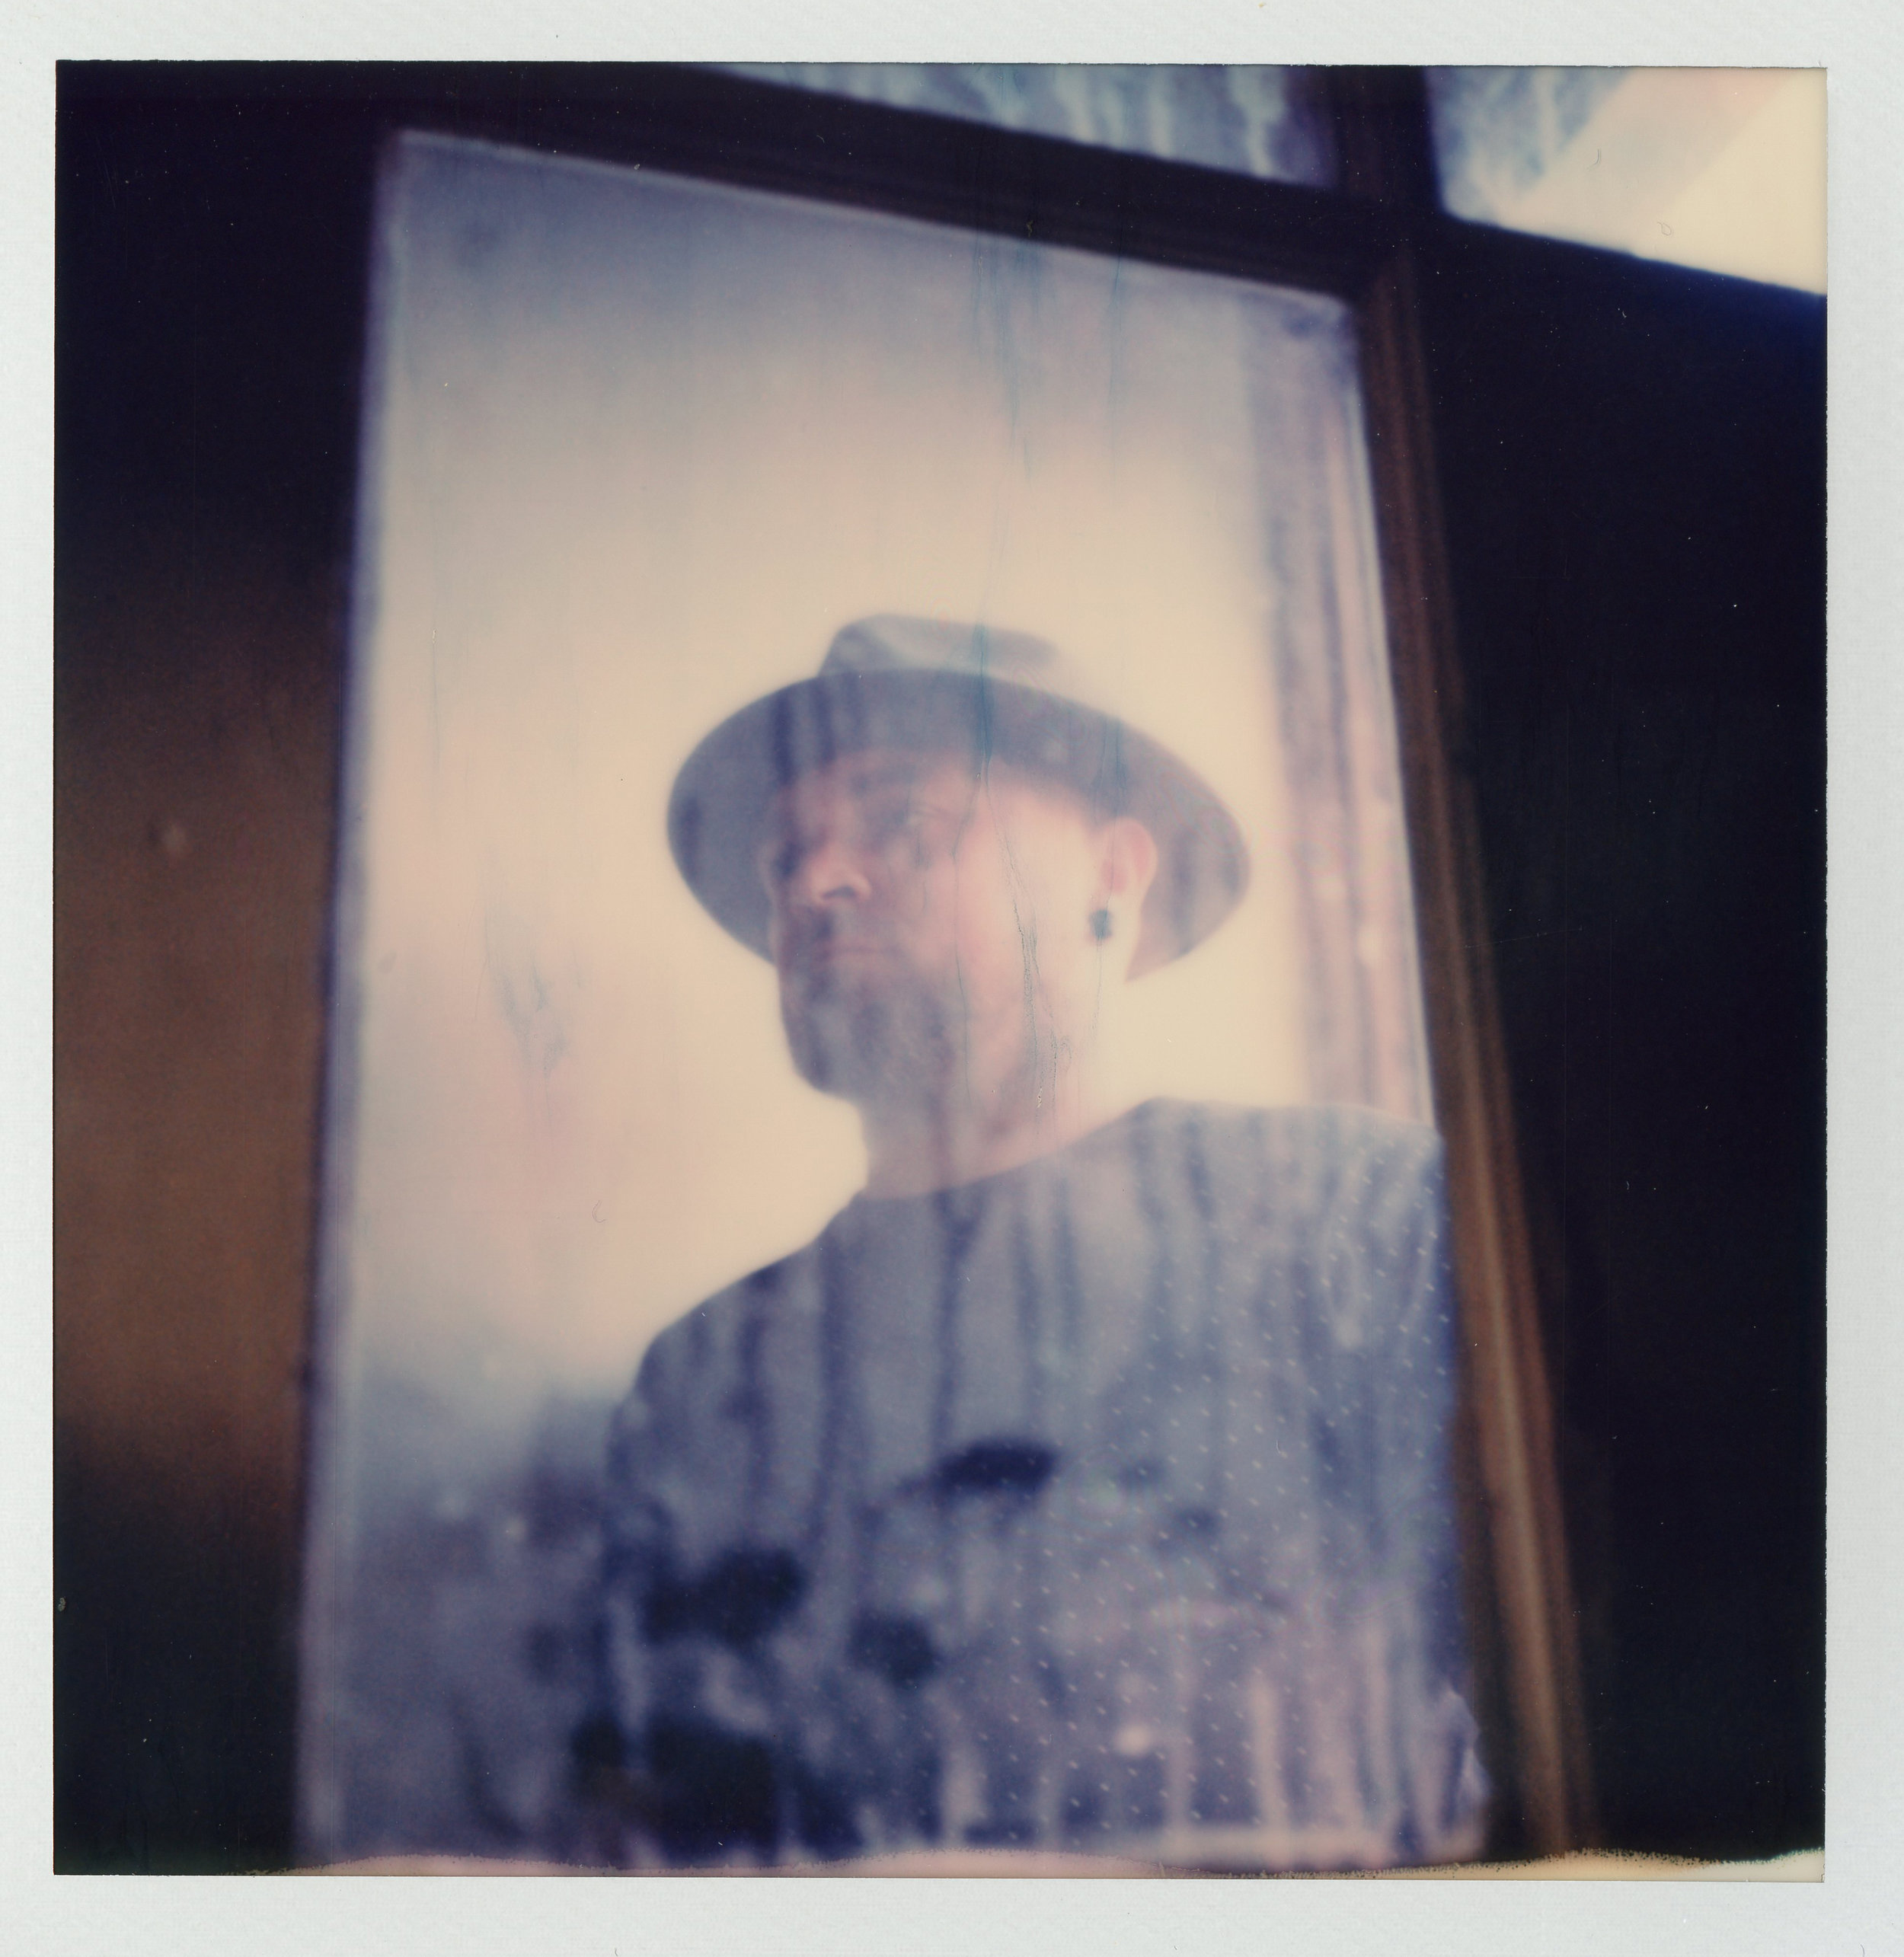 Aaron_Strumpel_Hymns_polaroid_06.jpg